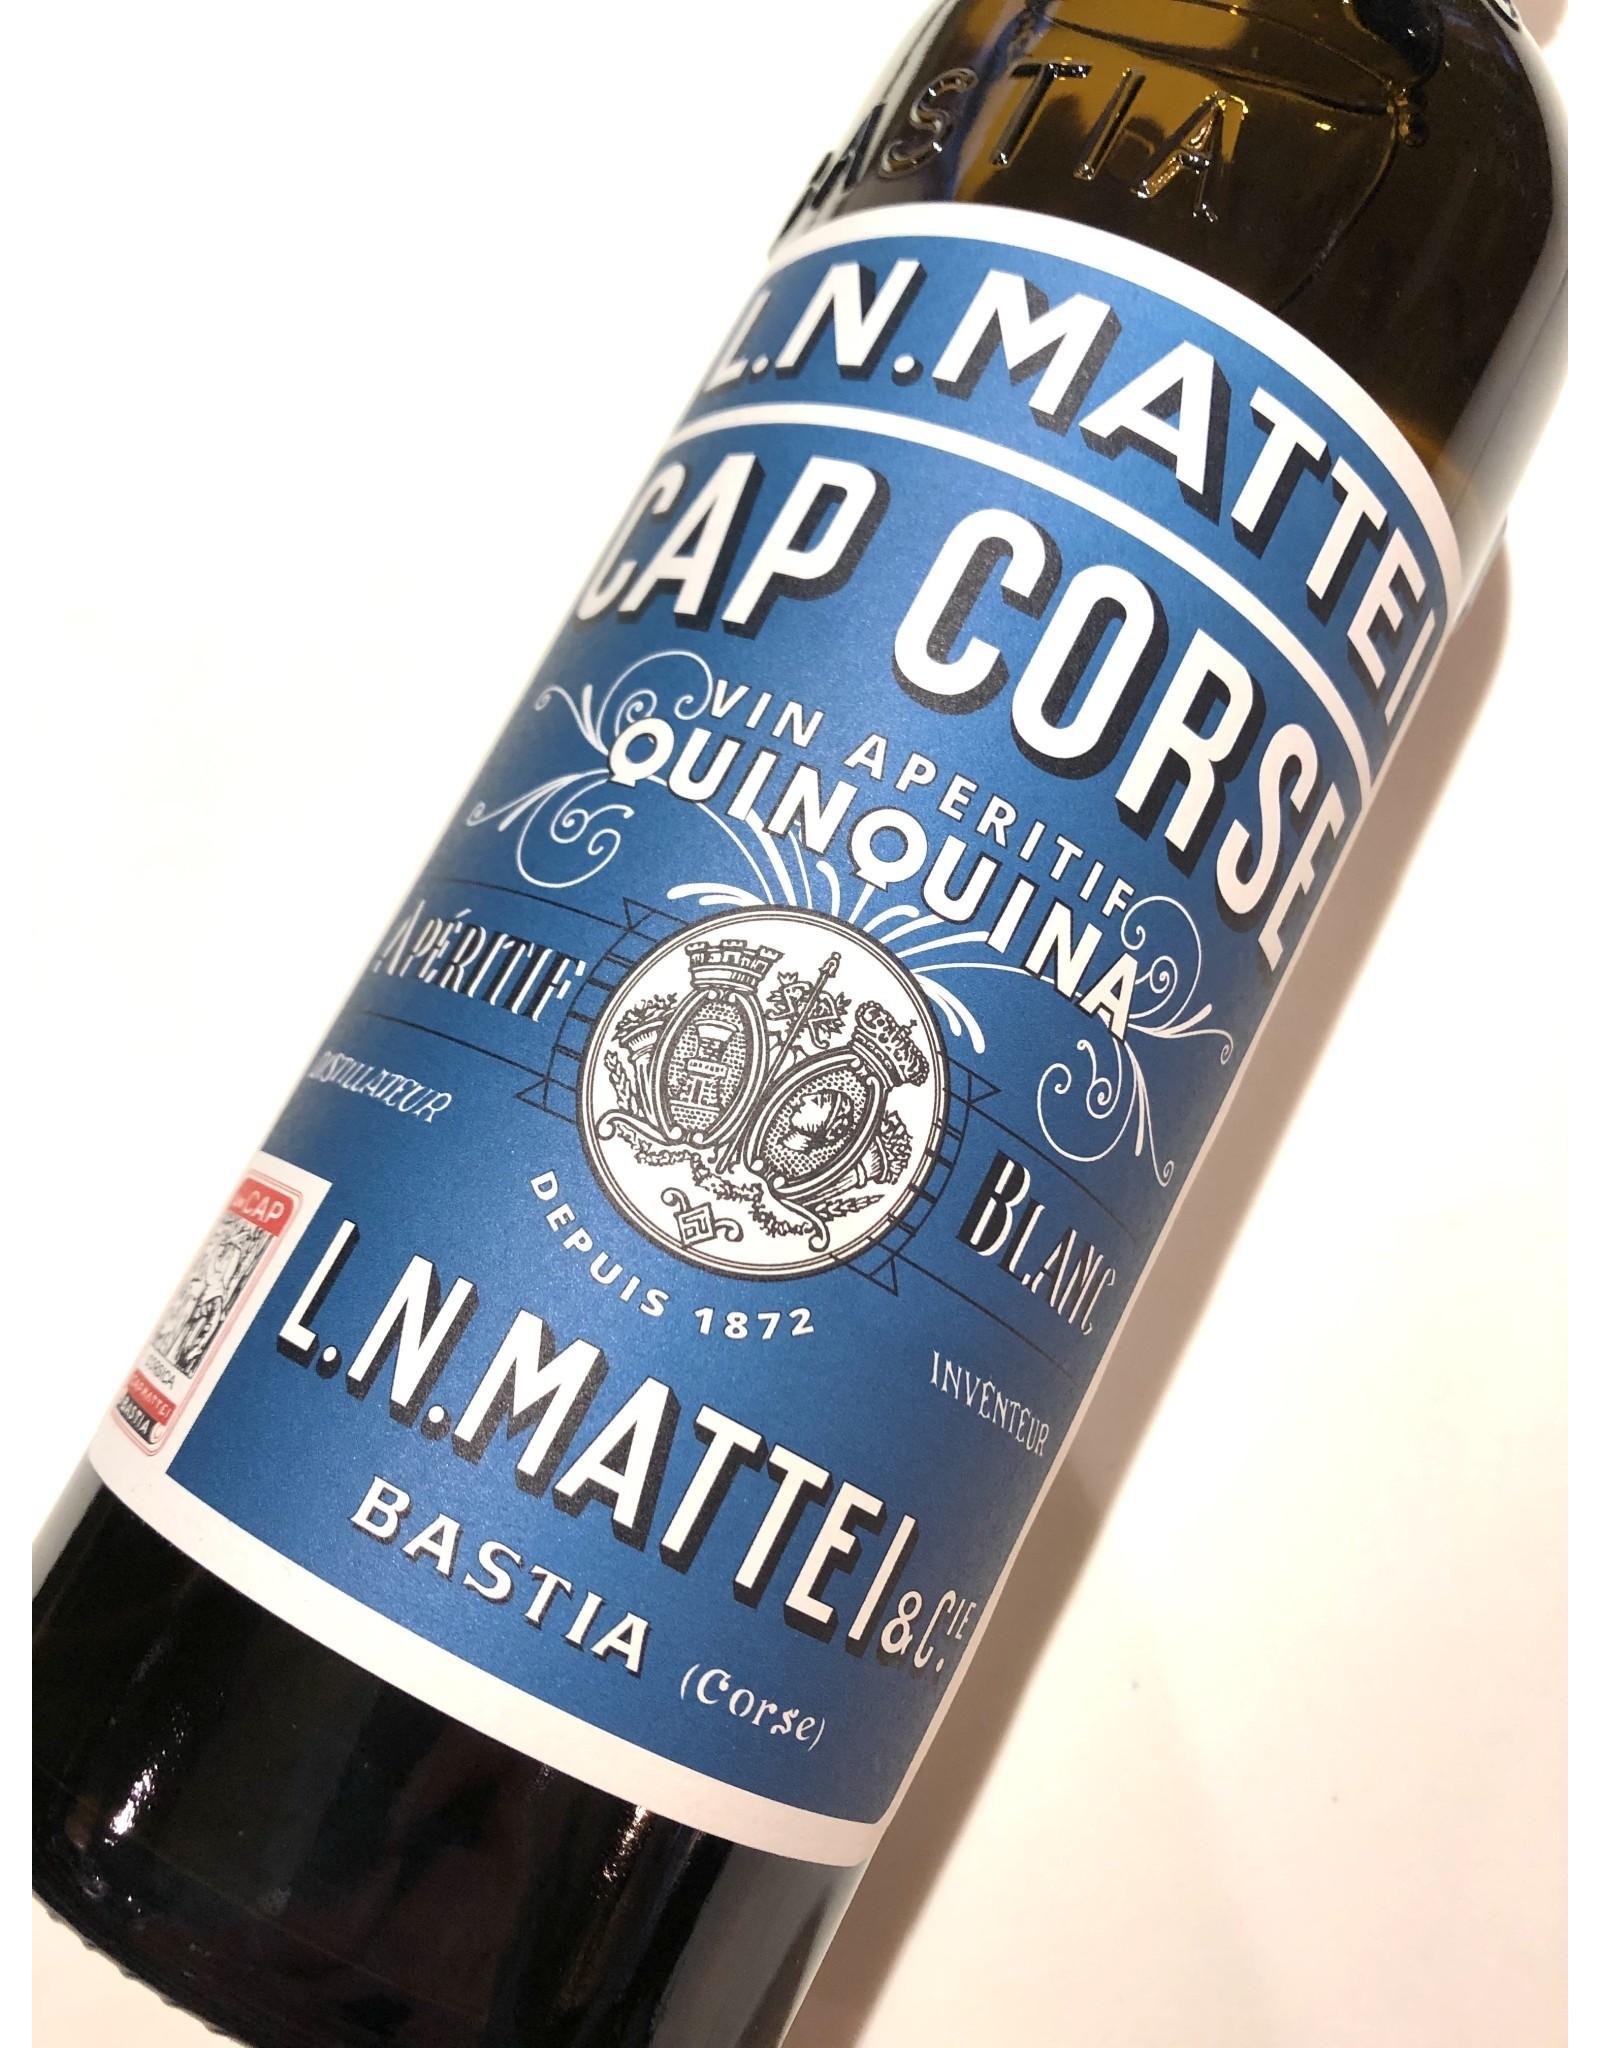 Cap Corse Blanc - 750 ML